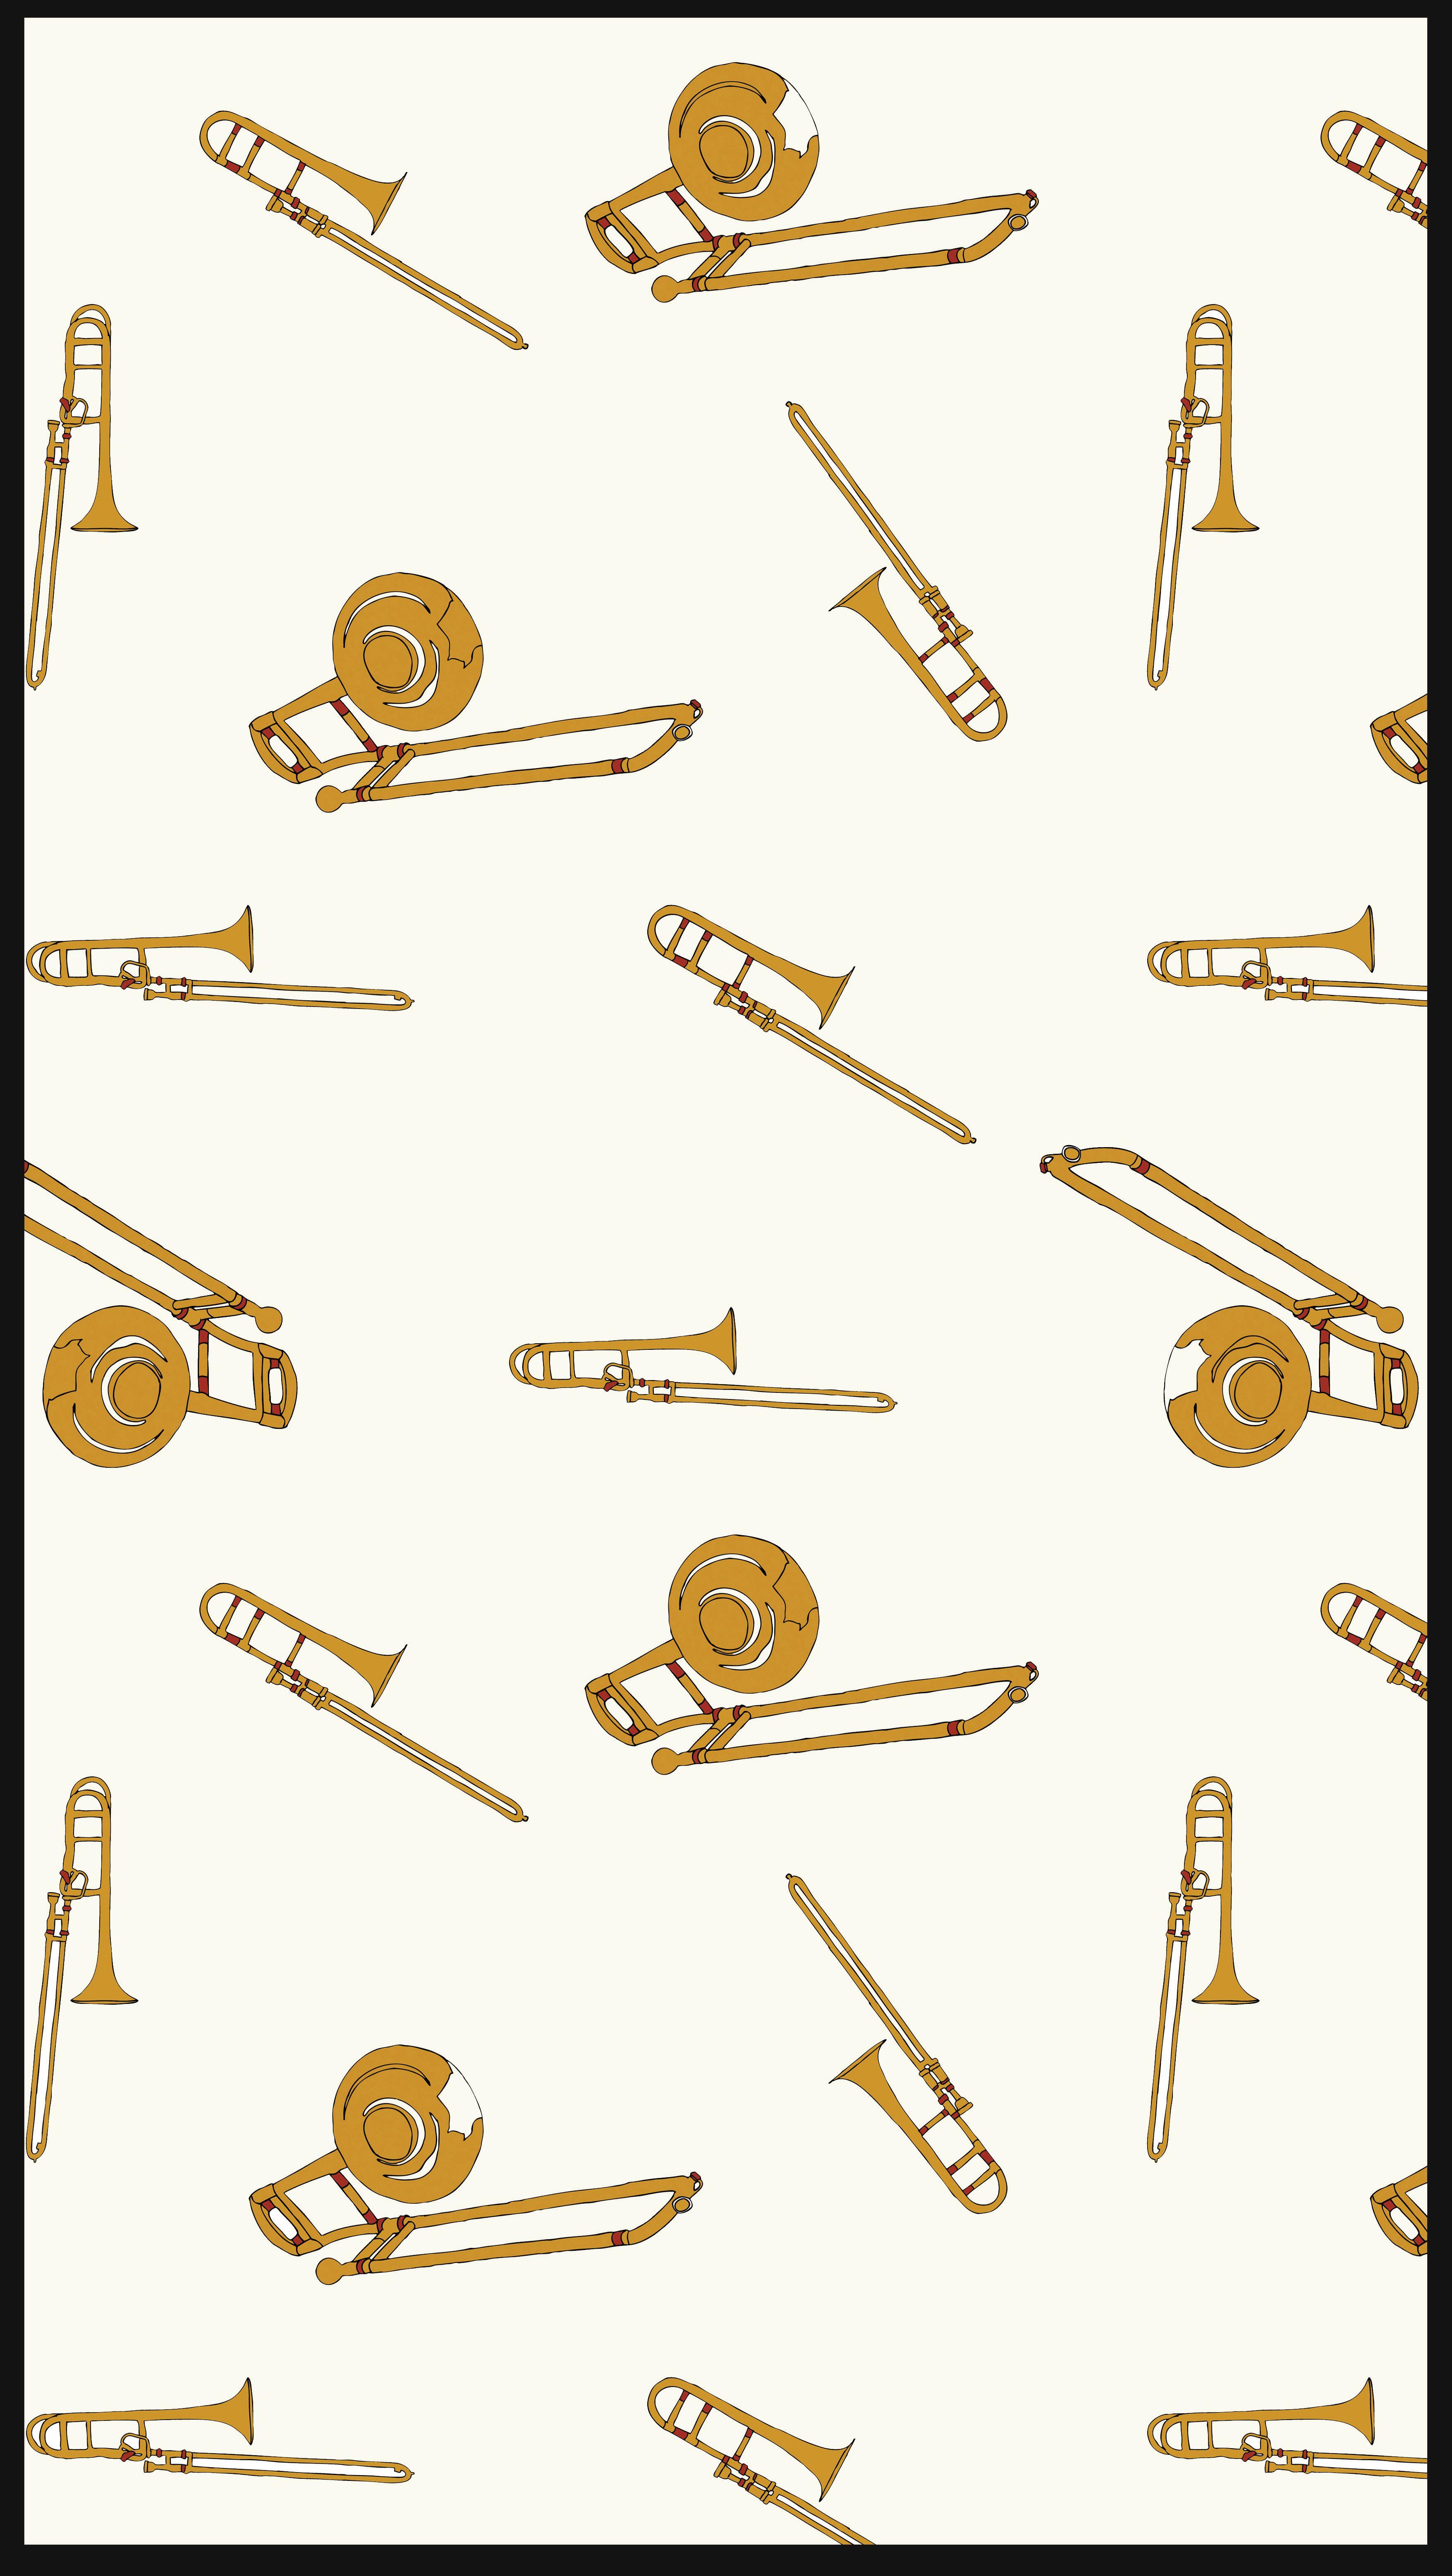 76 trombones clipart transparent library Trombones | Drawing in 2019 | Trombone sheet music, Trombone ... transparent library